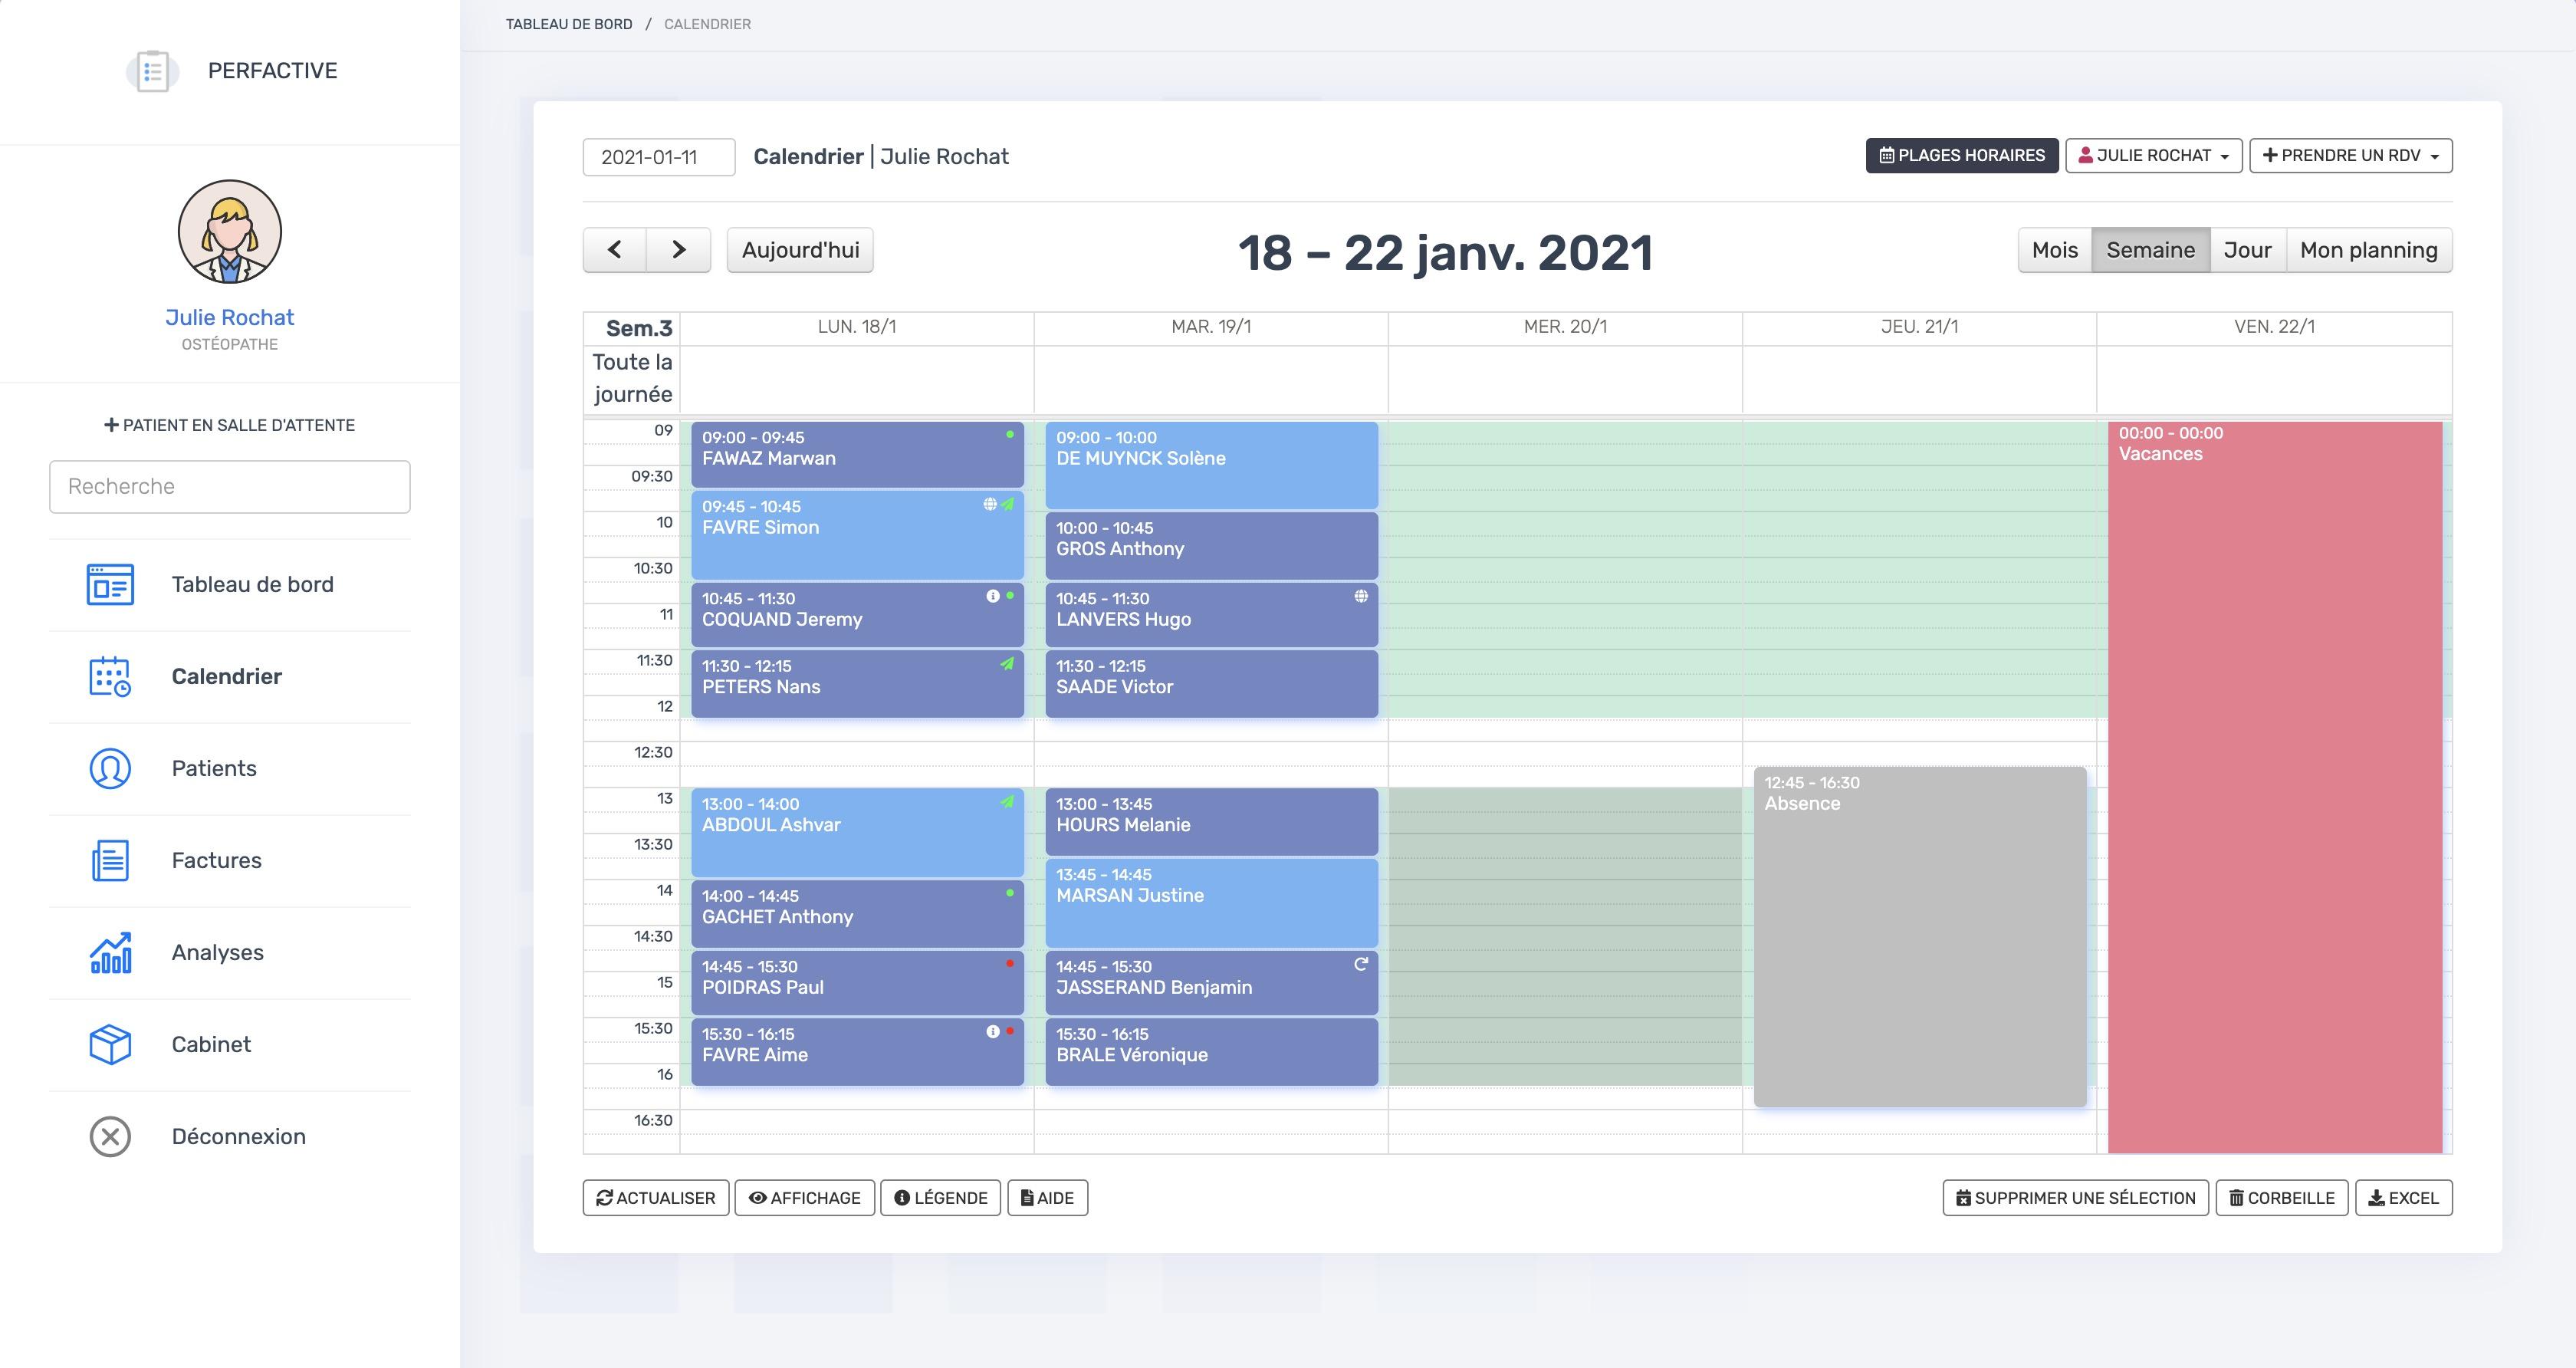 Le calendrier | PERFACTIVE